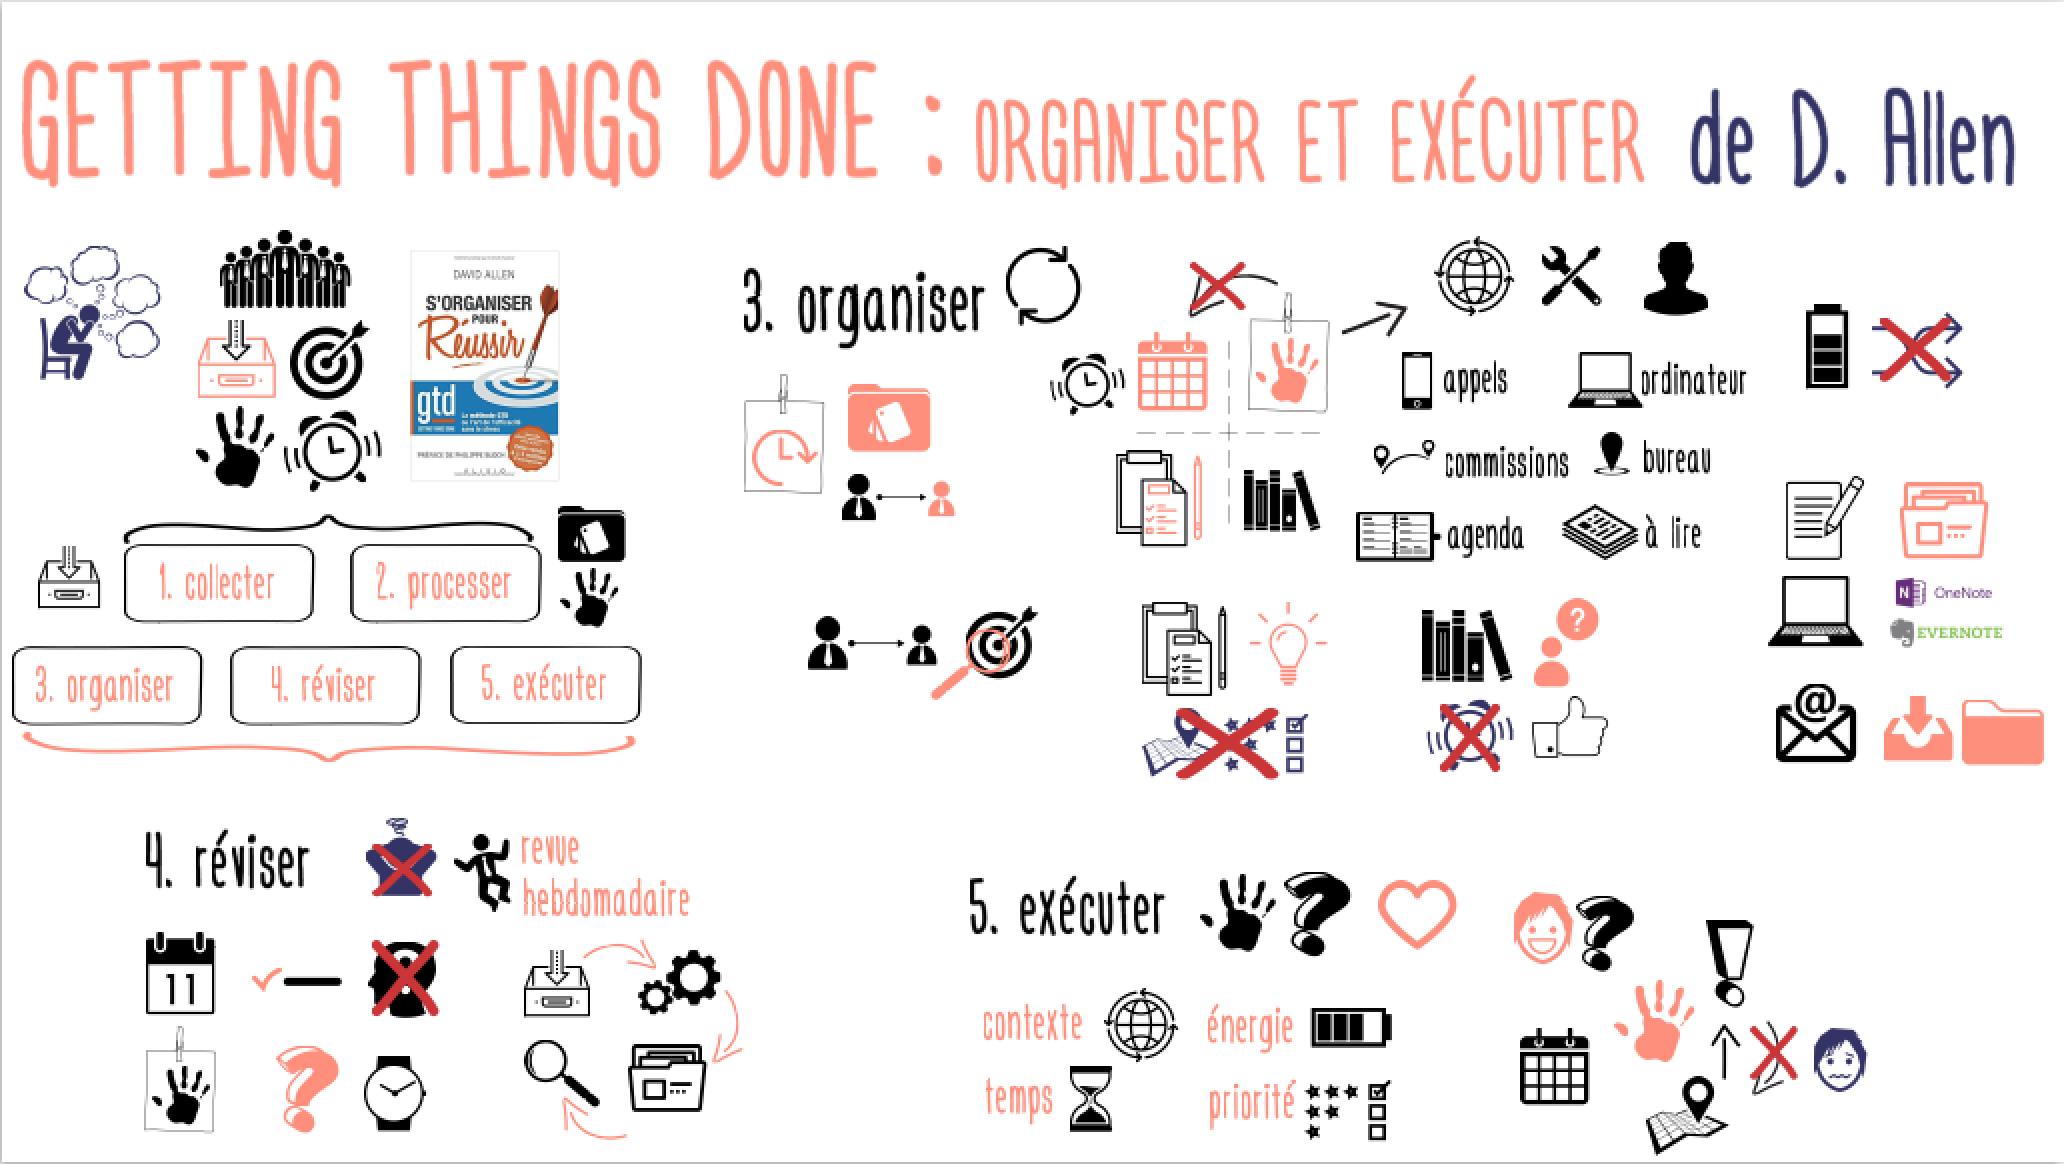 GettingThingsDone_OrganiserExecuter